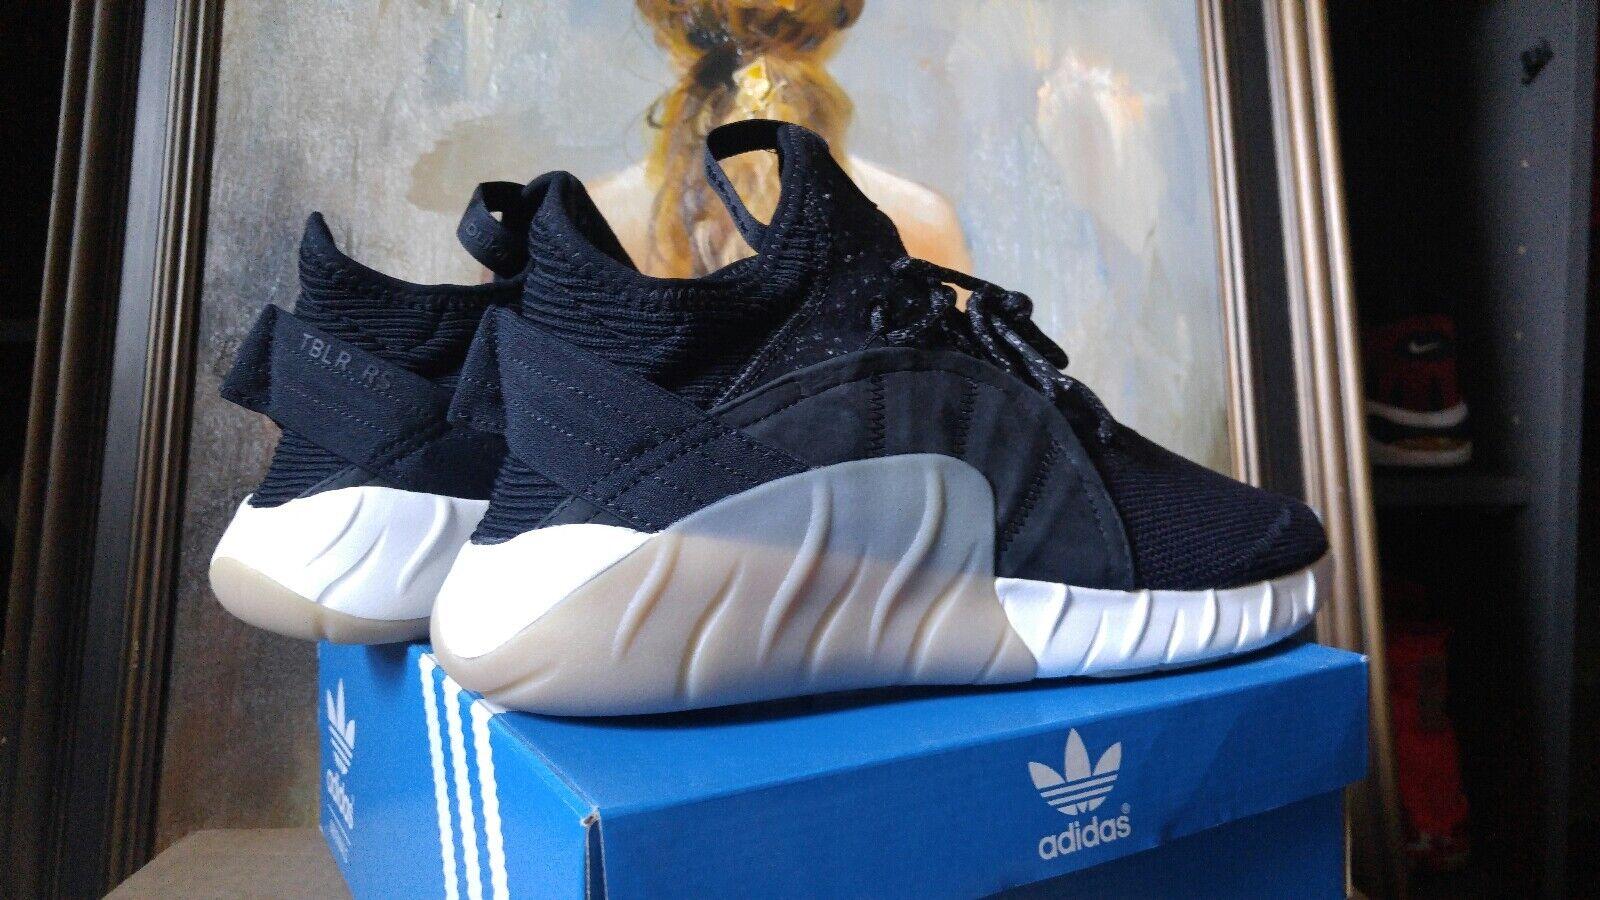 4362b0f05 Adidas Tubular Rise Size Size Size 10 10.5 11 12 Black White BY3555 very  nice 1aec9b